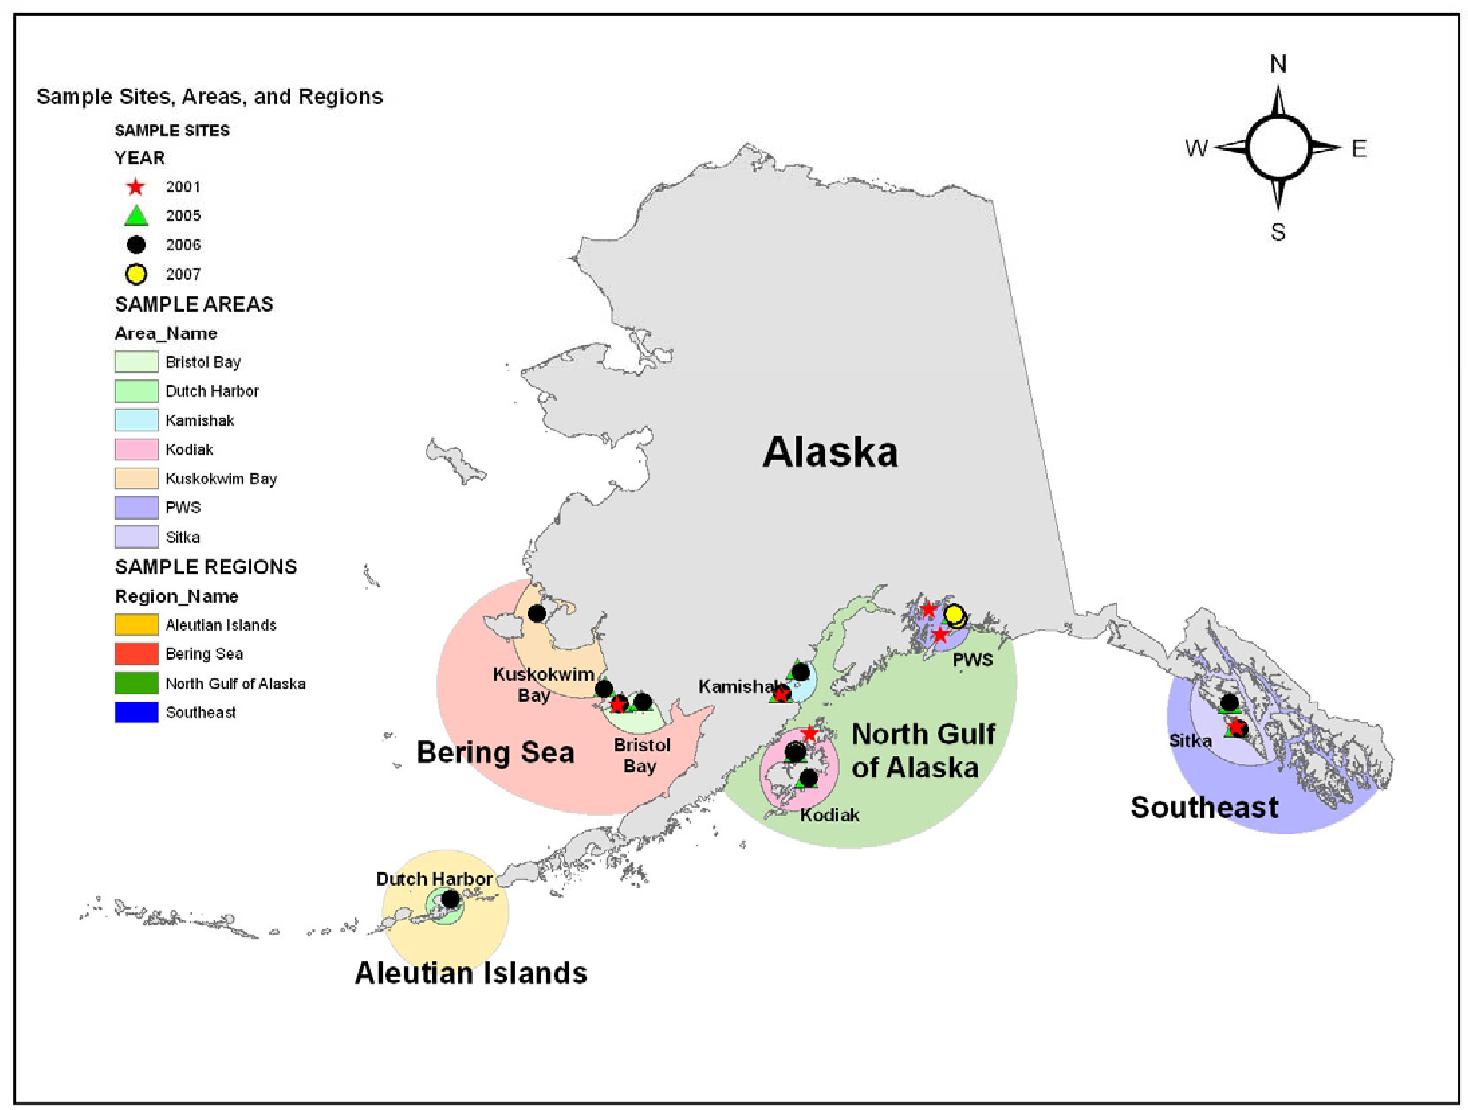 Figure 1 from Exxon Valdez Oil Spill Restoration Project Final